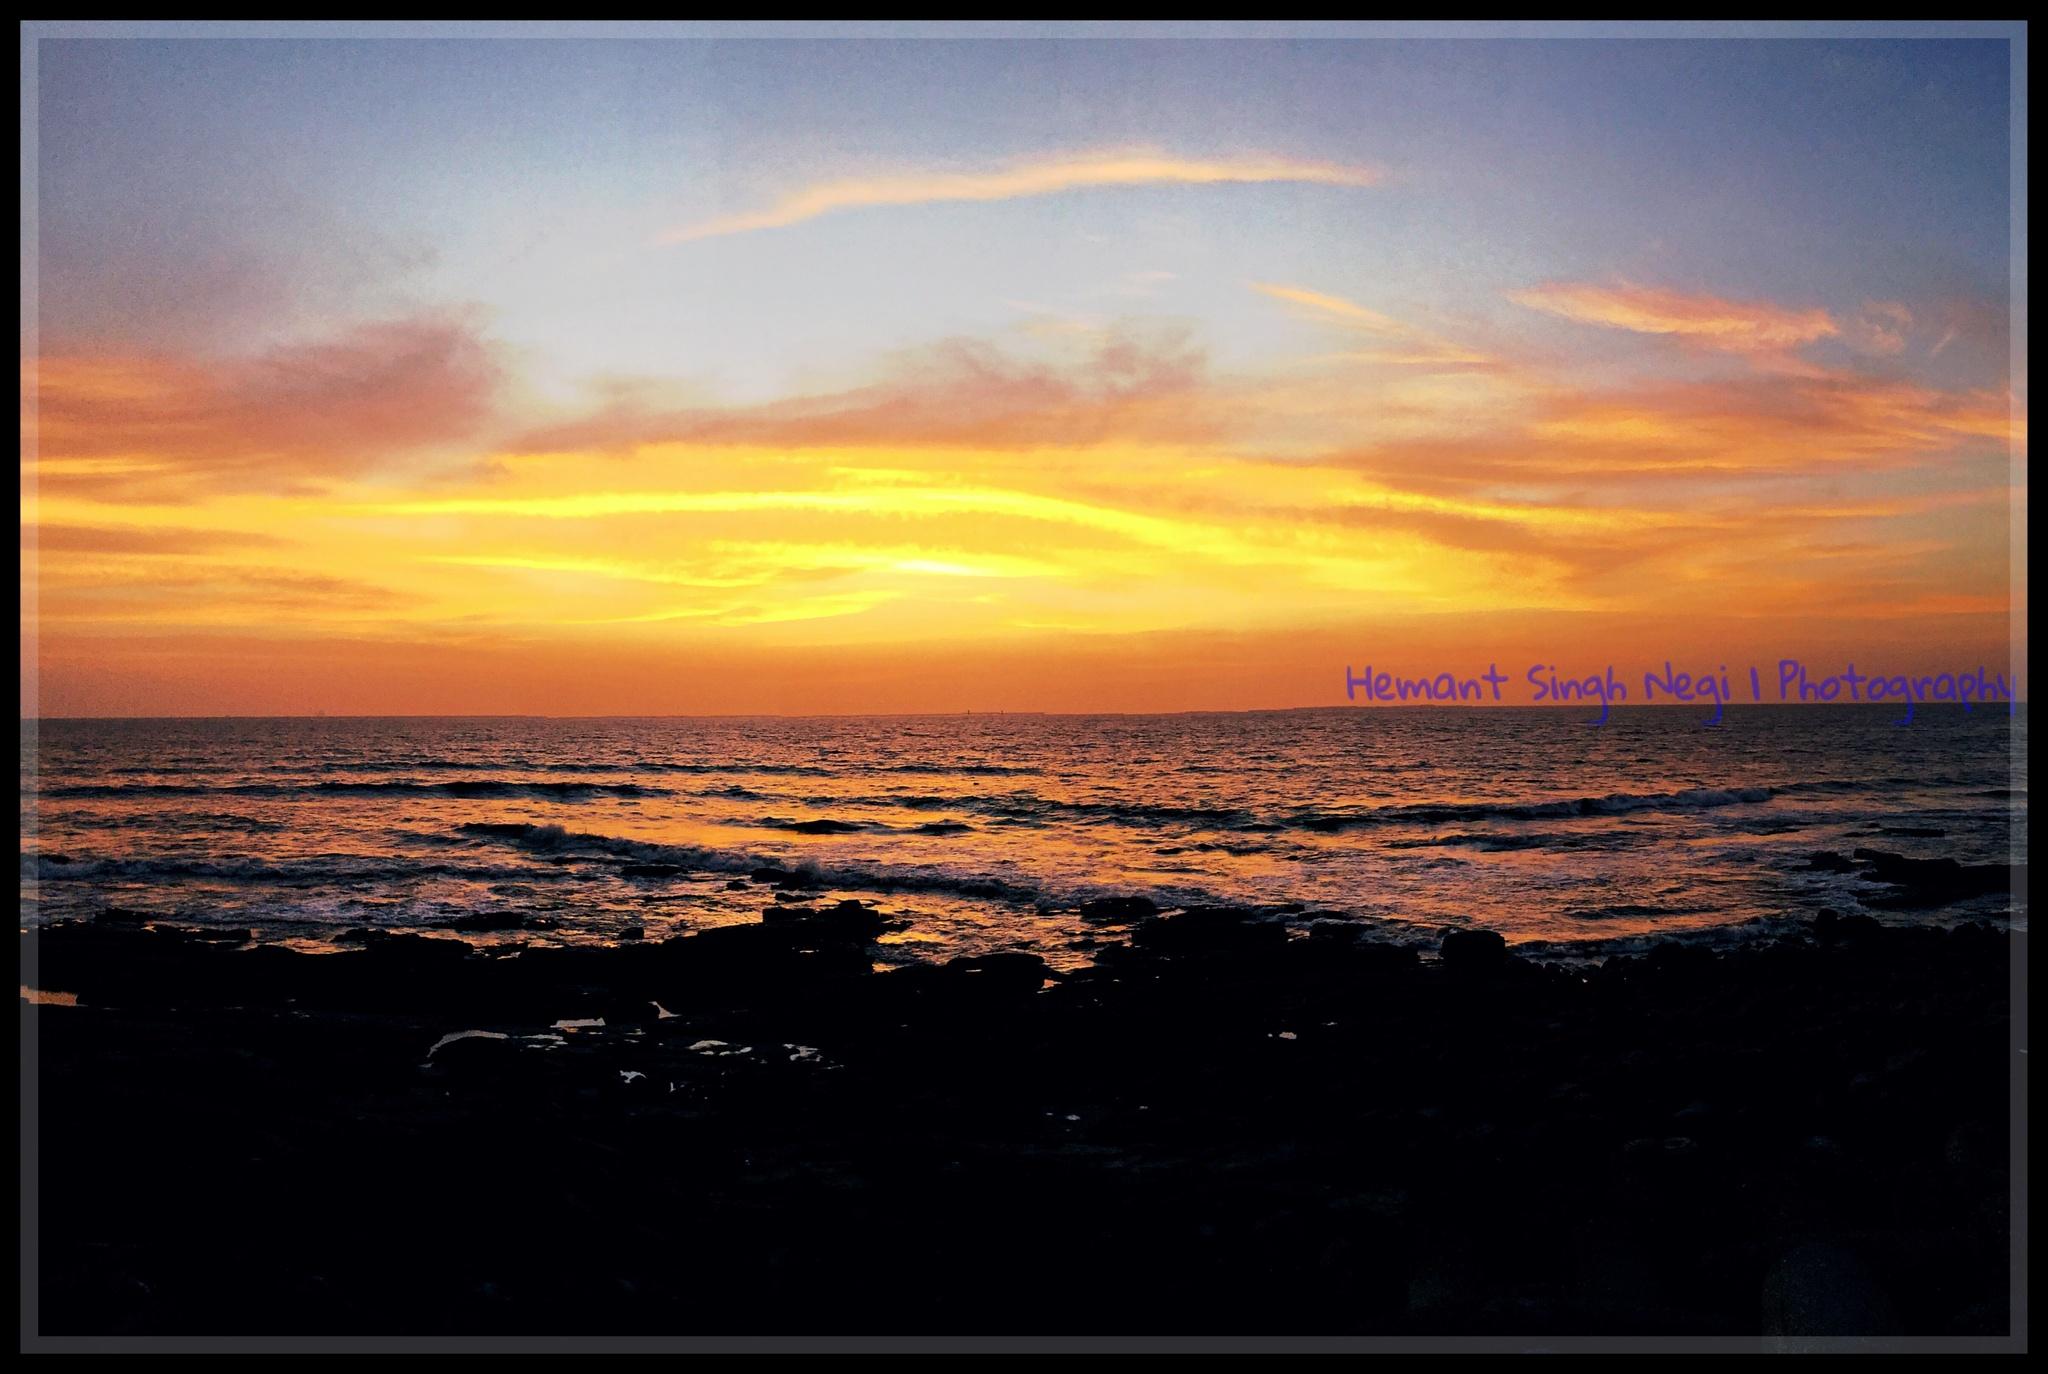 Sunset by HEMANT SINGH NEGI